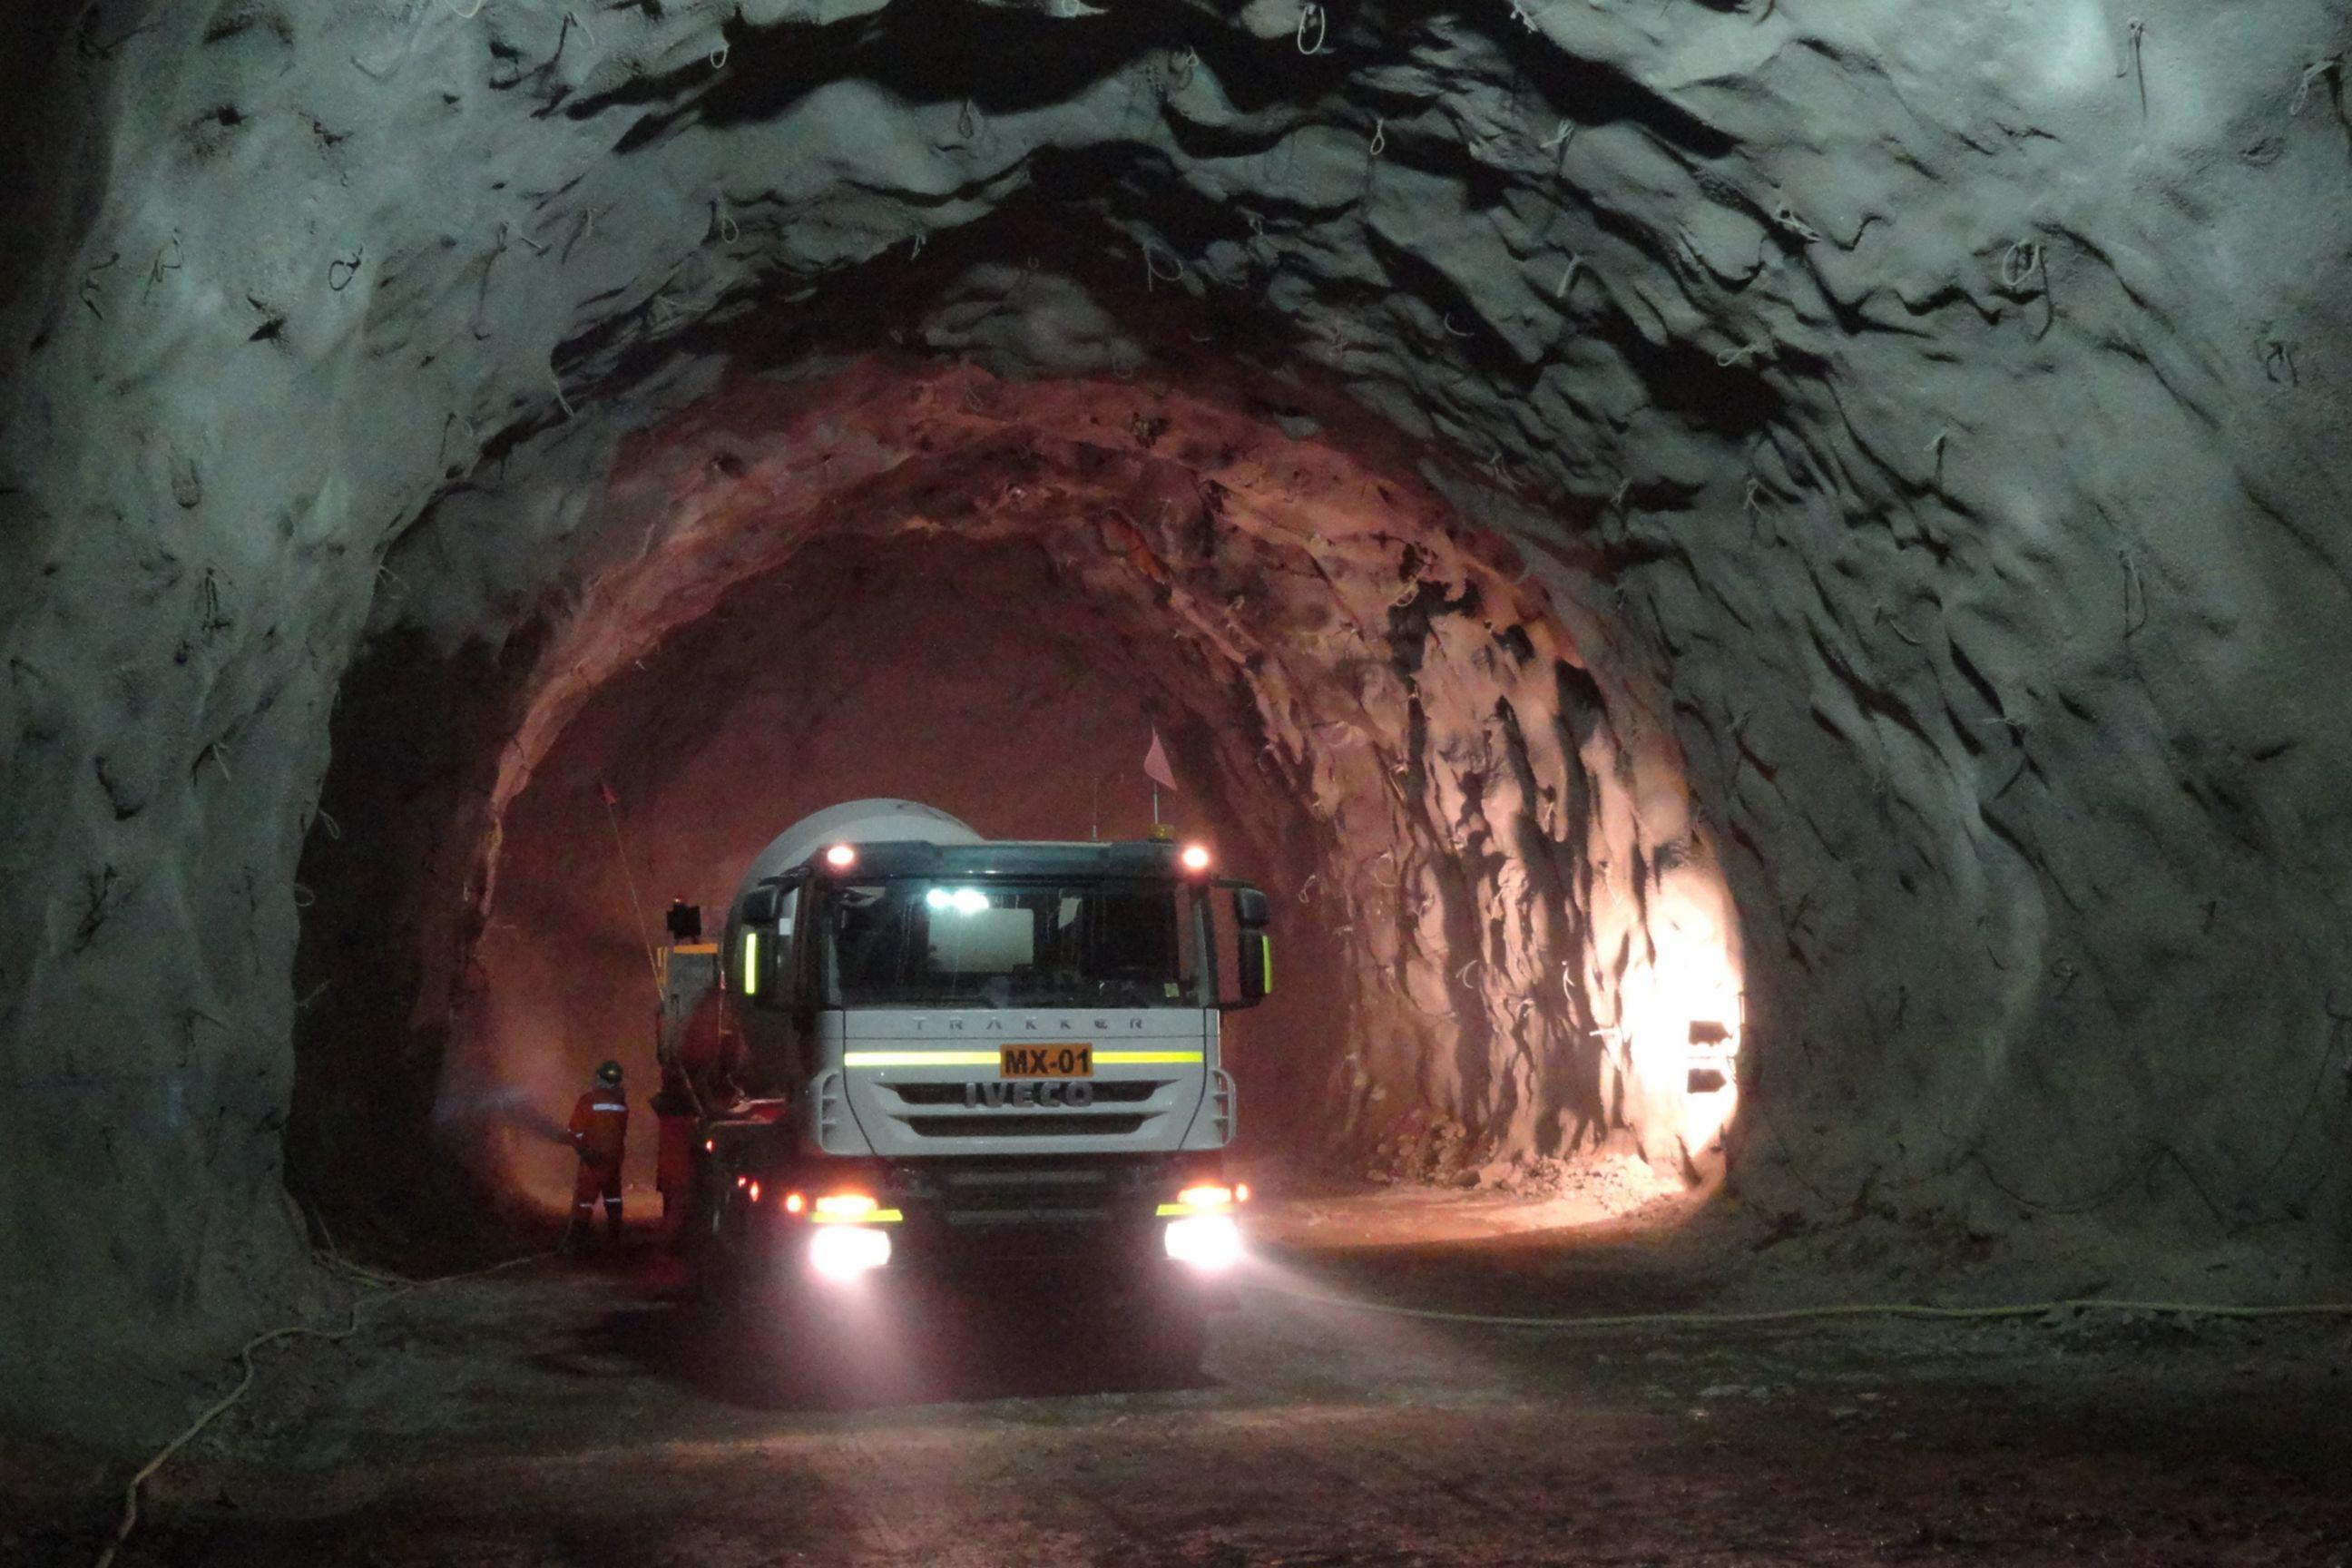 Construction at Chuquicamata Underground Mine in Chile